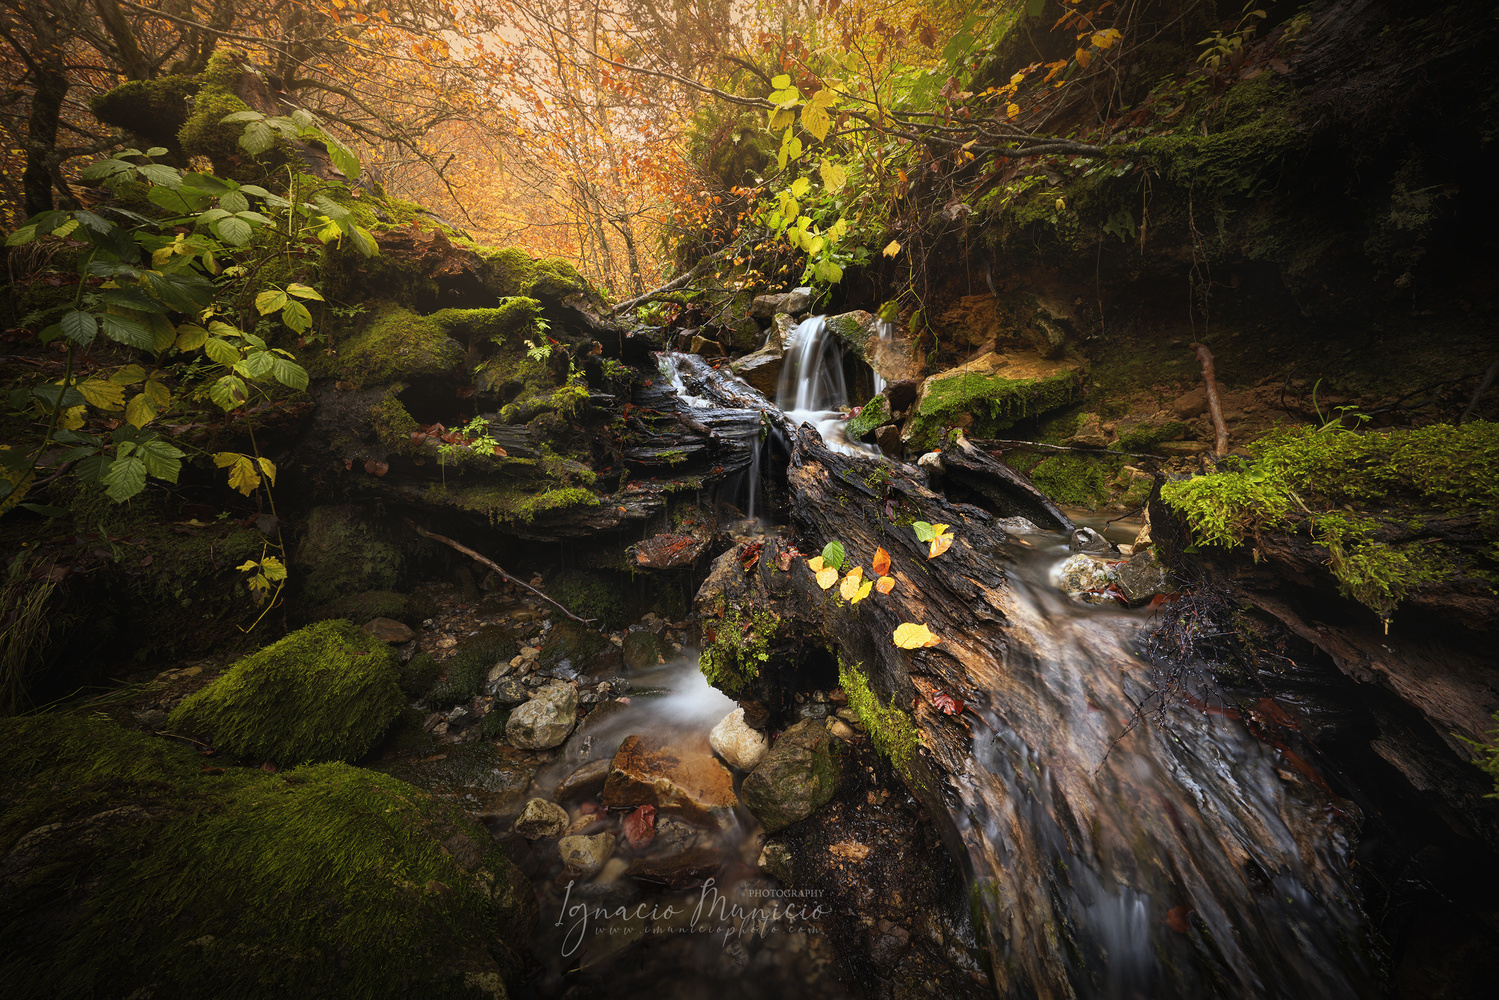 Forest by Ignacio Municio